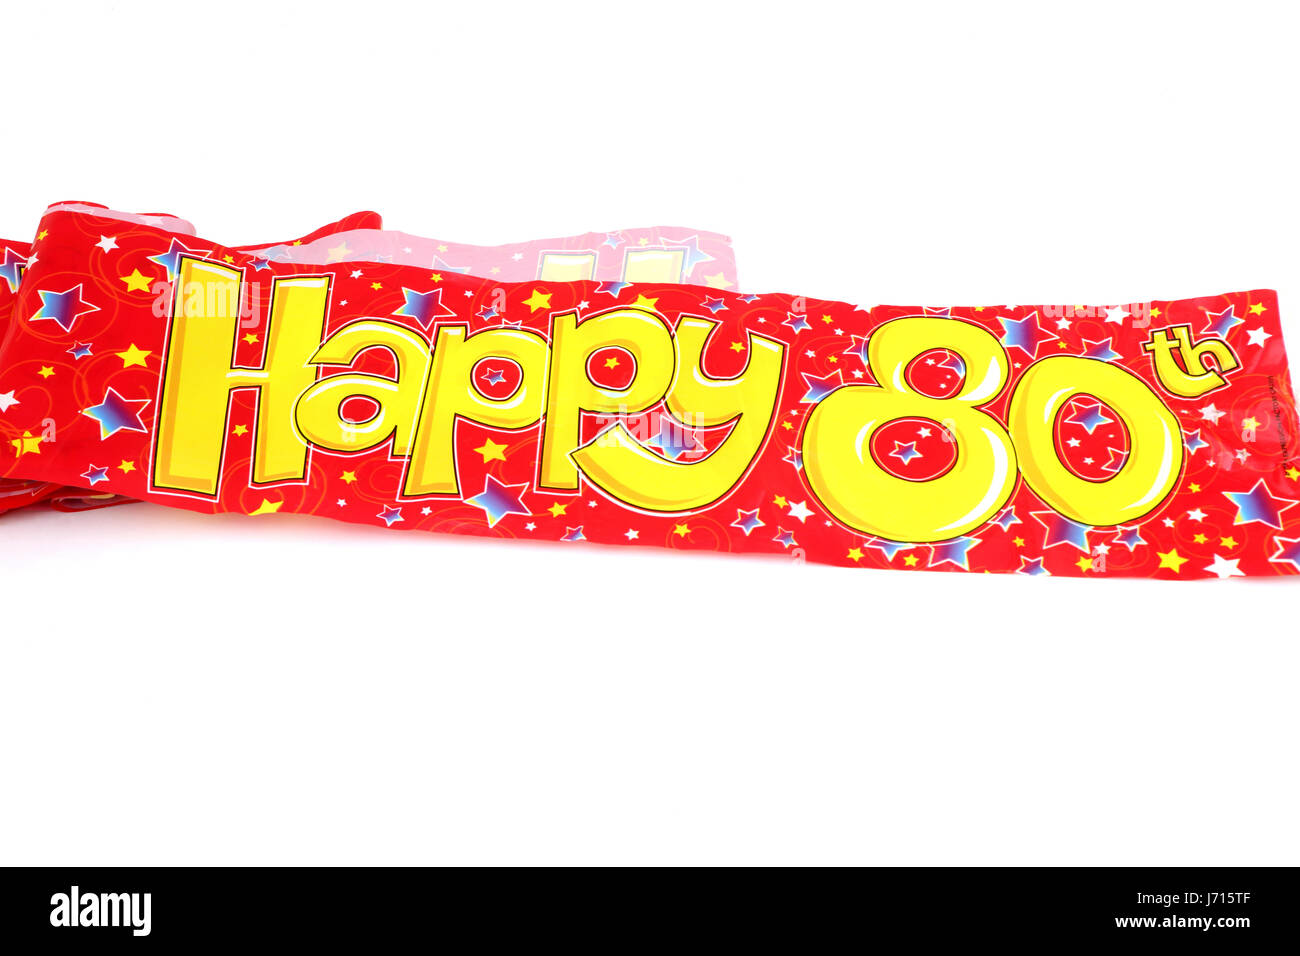 happy 80th birthday banner stock photo royalty free image